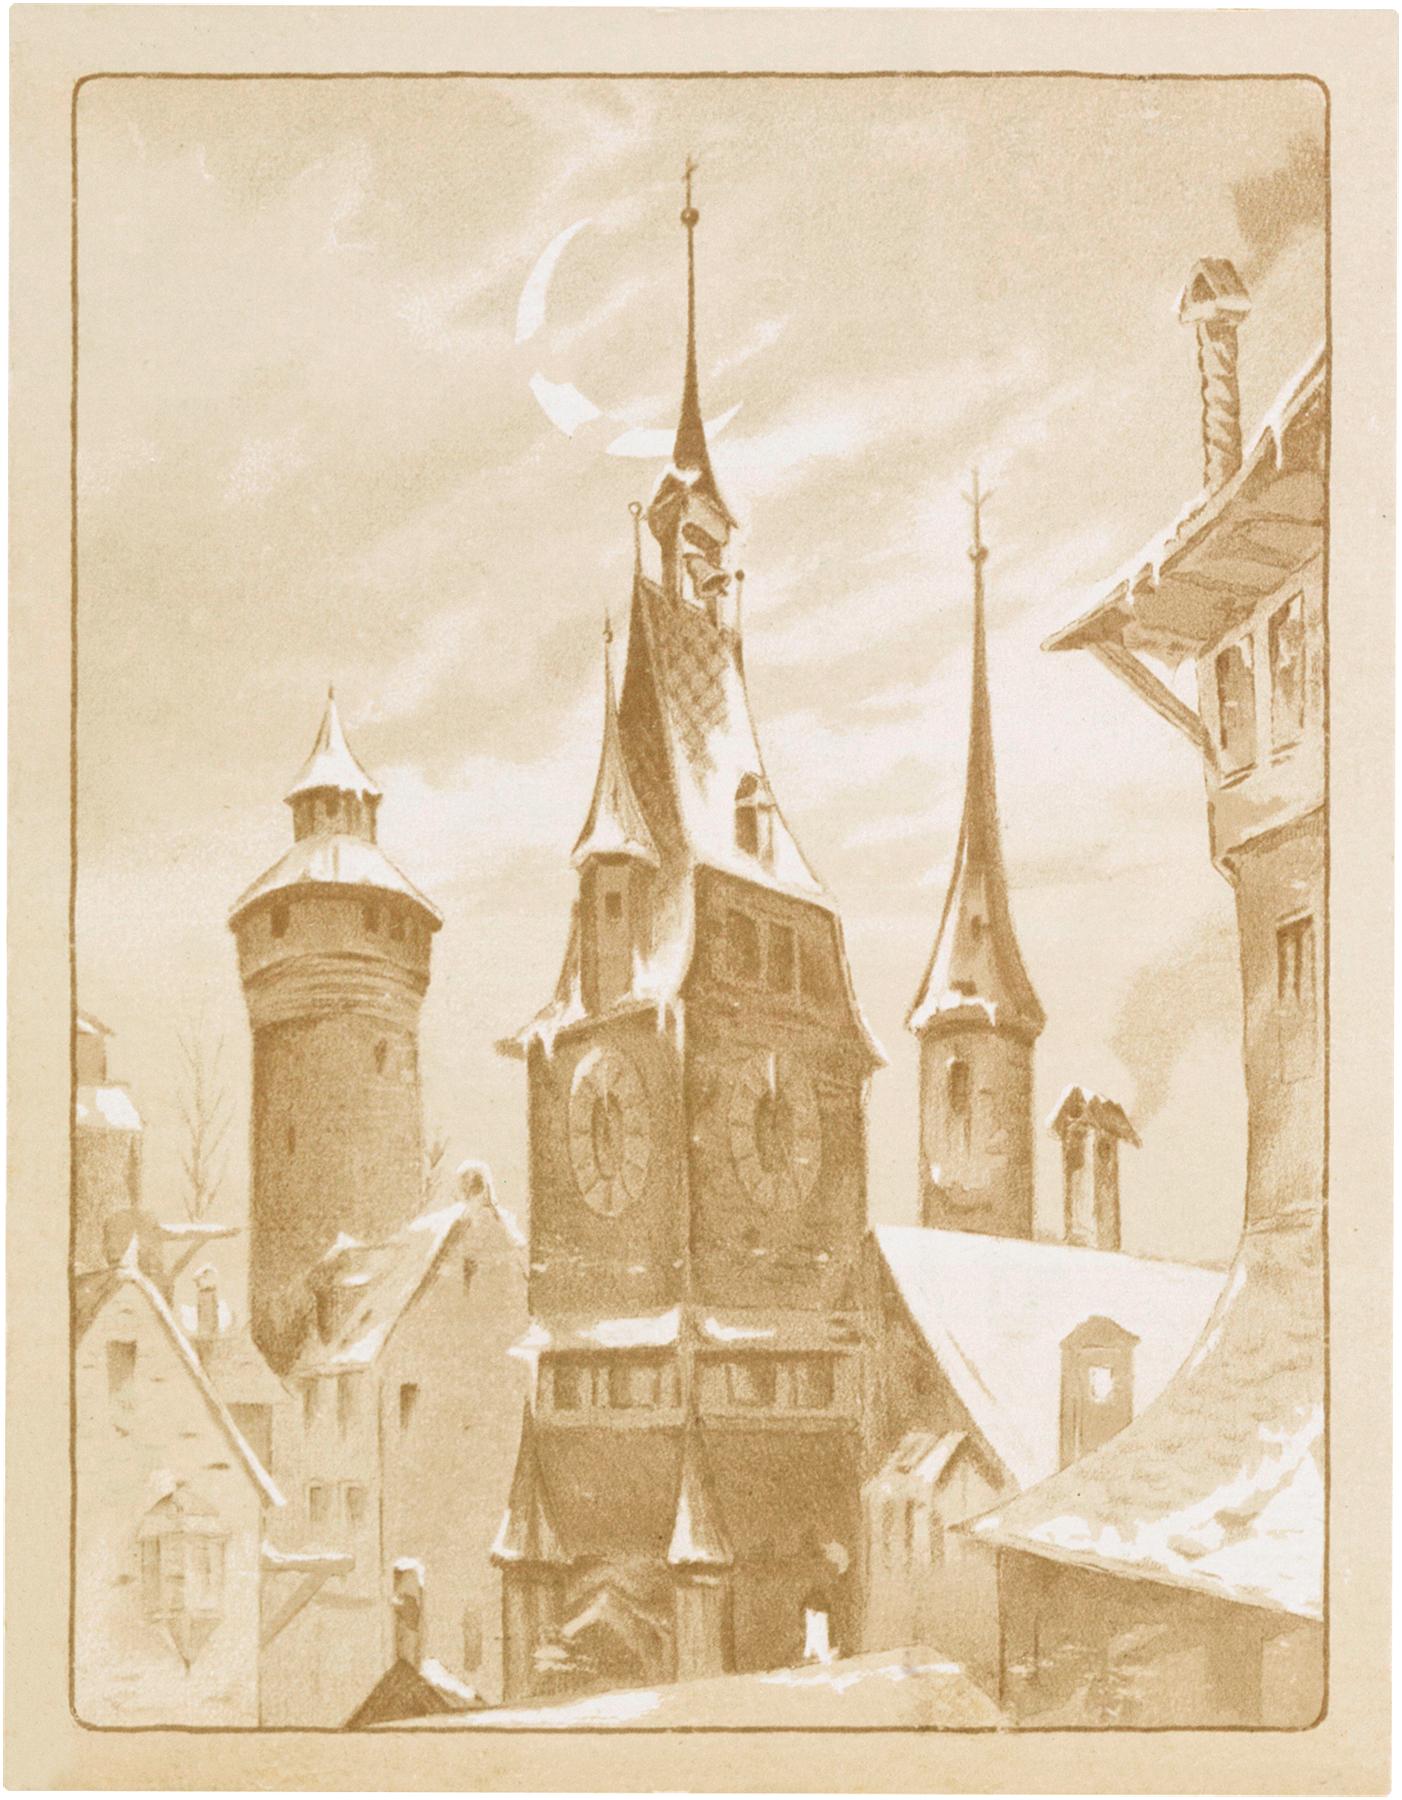 Vintage Snowy Church Image